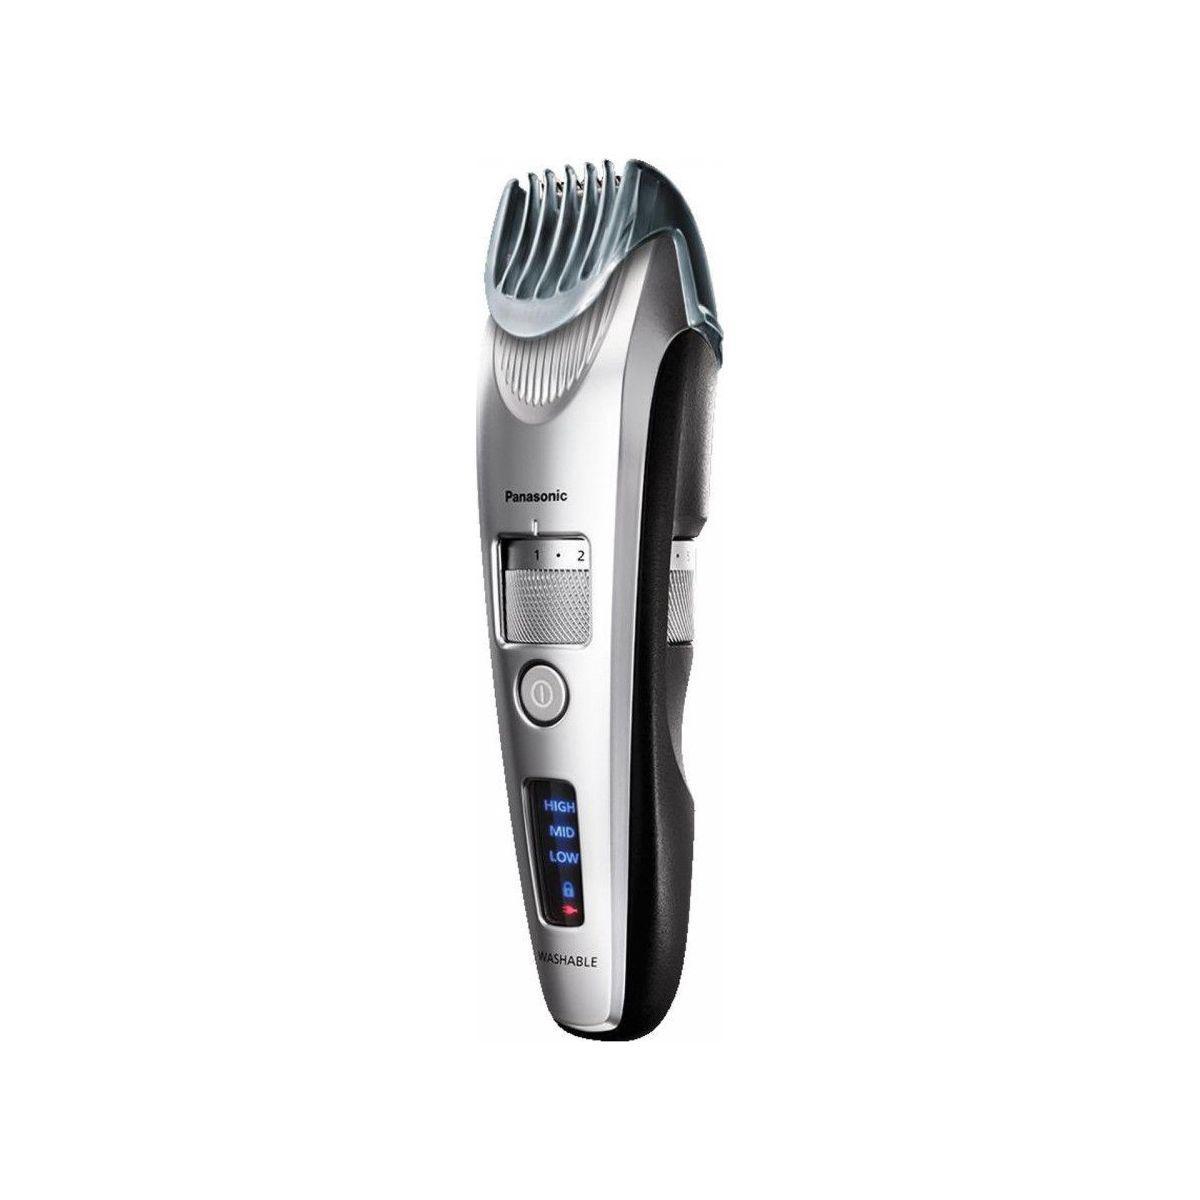 Tondeuse barbe panasonic er-sb60-s803 (photo)